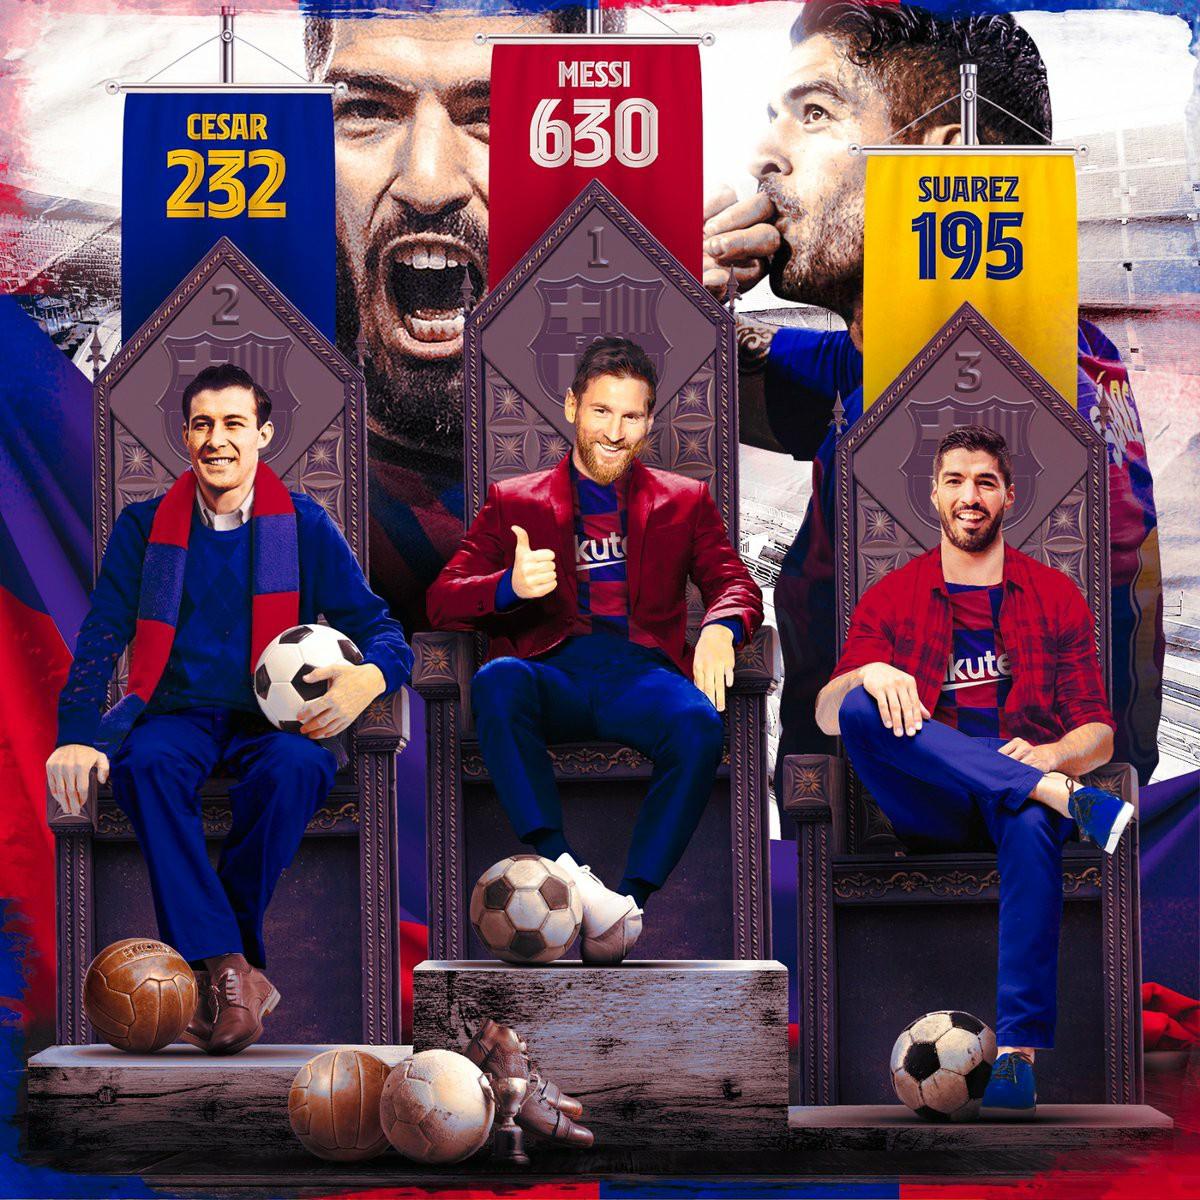 Most Barca Official Goals:  1. Messi 630 2. Cesar 232 3. Suarez 195 https://t.co/DIIQX4EFSo